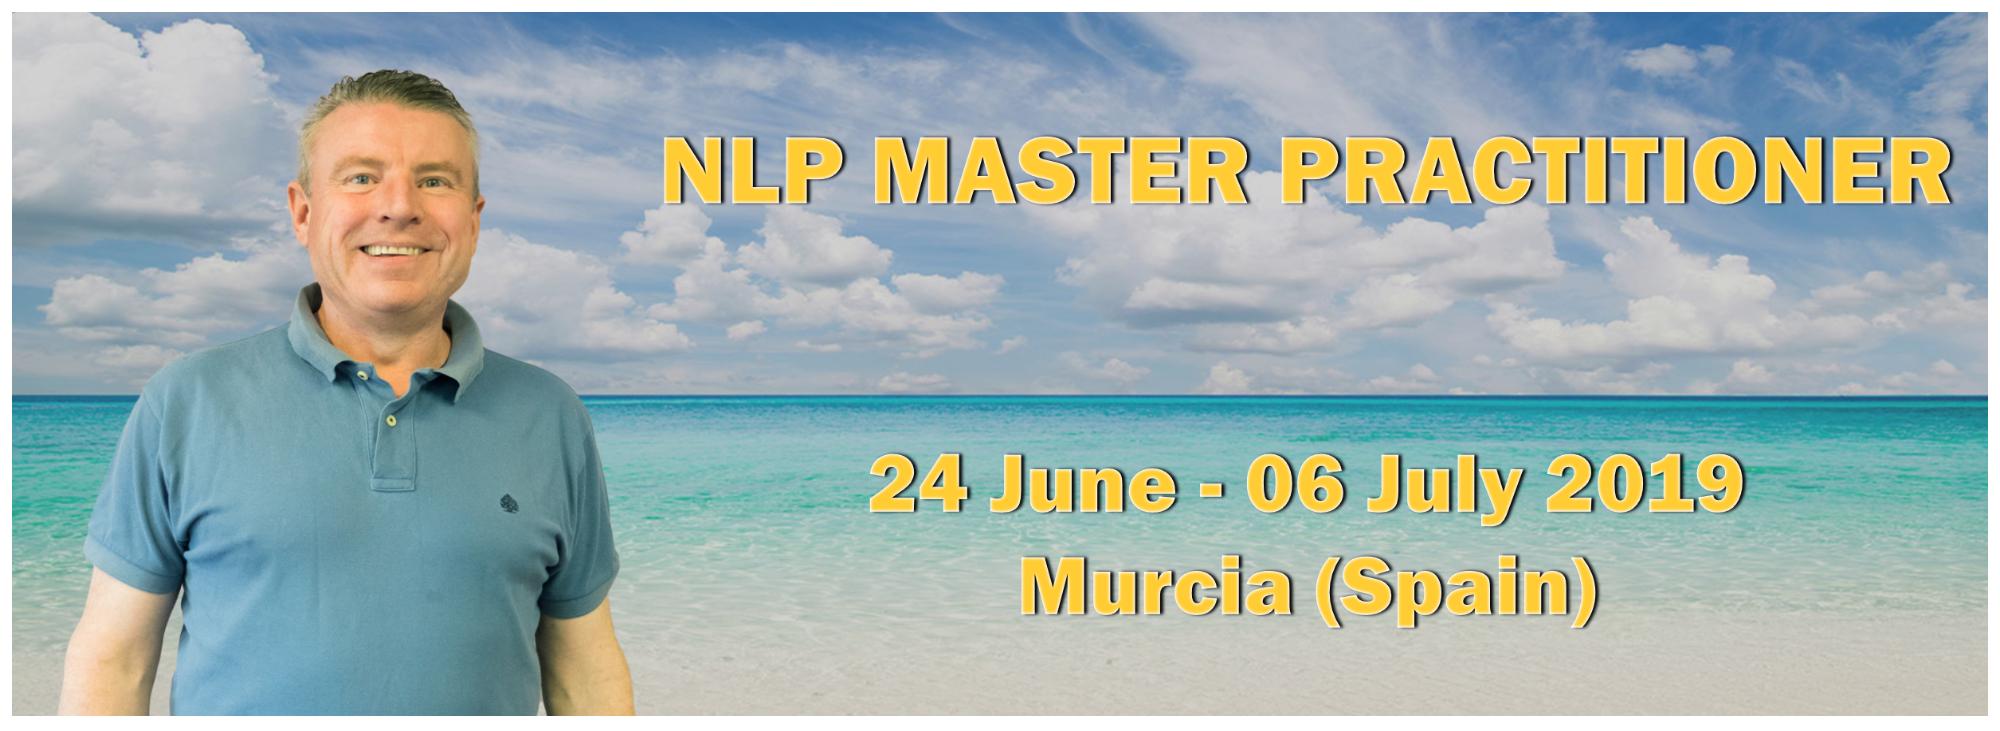 NLP Master Practitioner Certification (Spain)